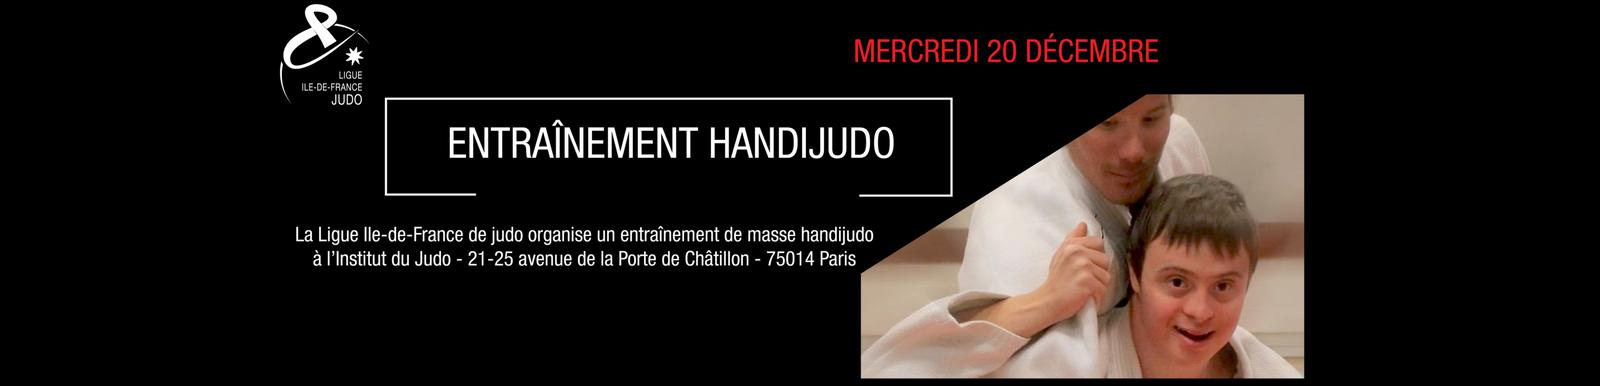 banniere-web-slide-show-handi